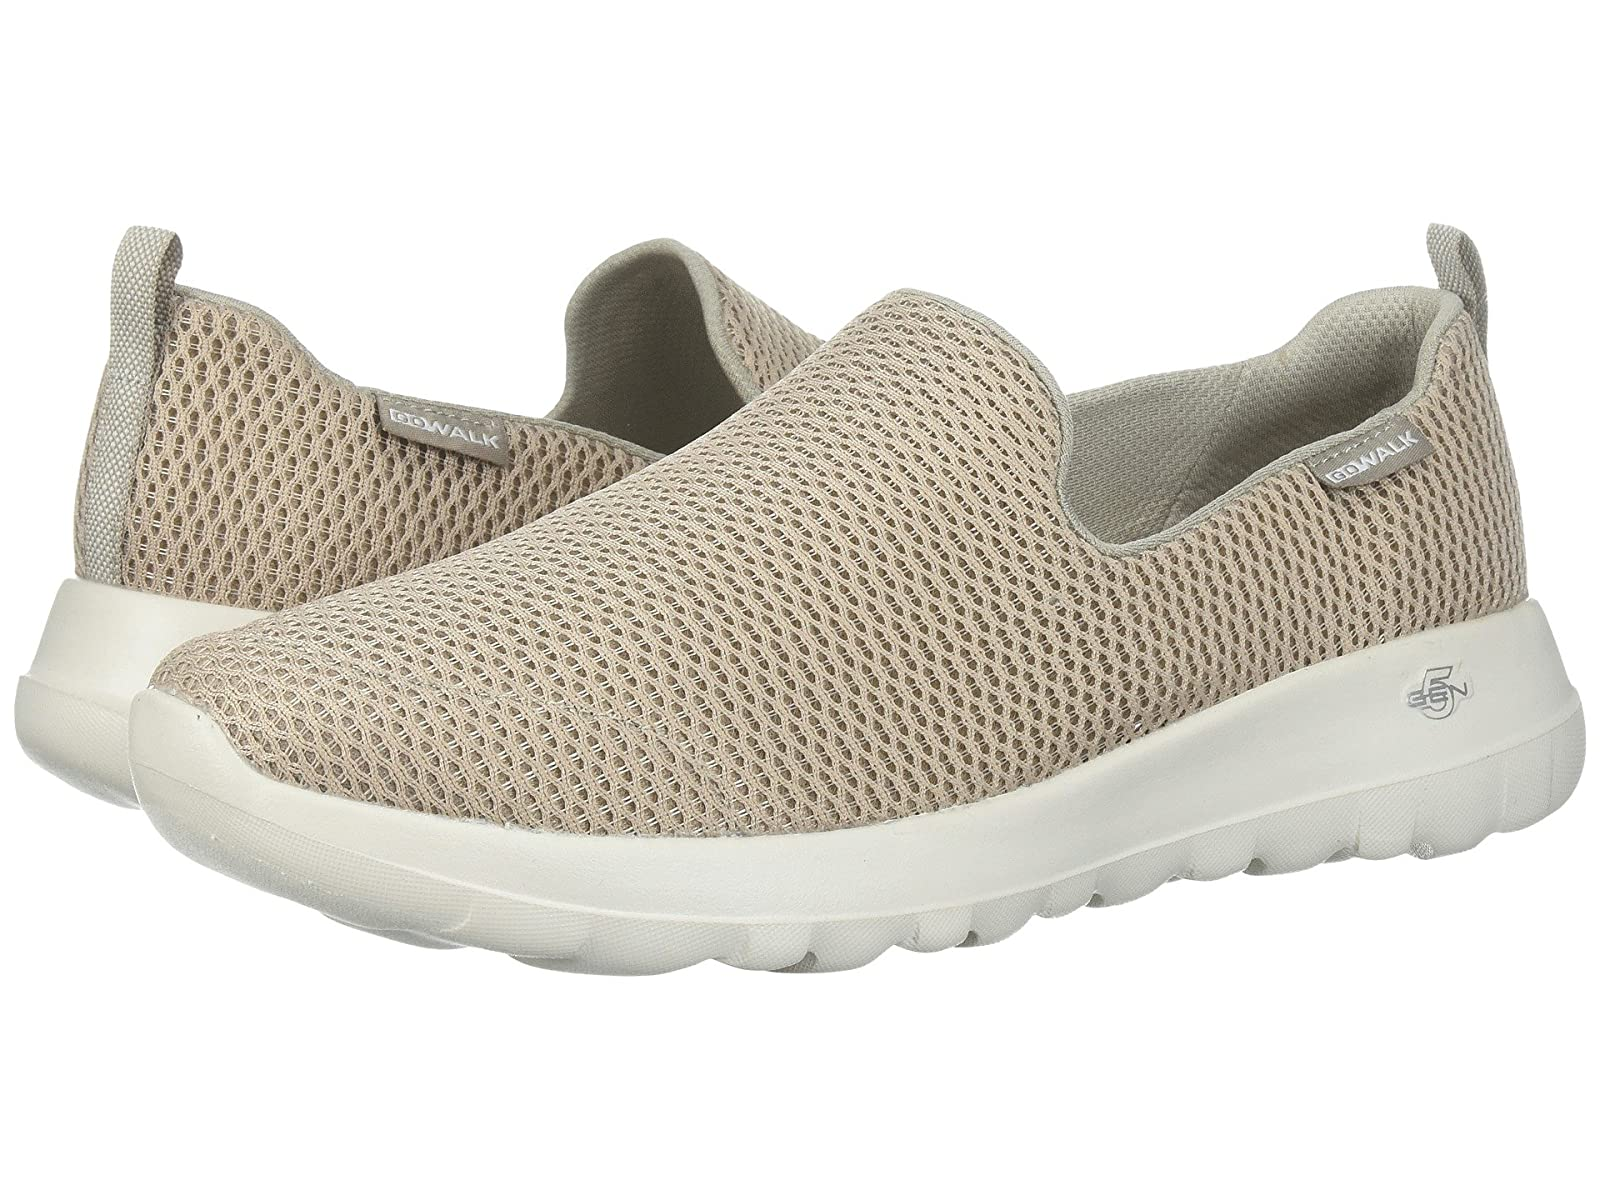 SKECHERS Performance Go Walk JoyAtmospheric grades have affordable shoes